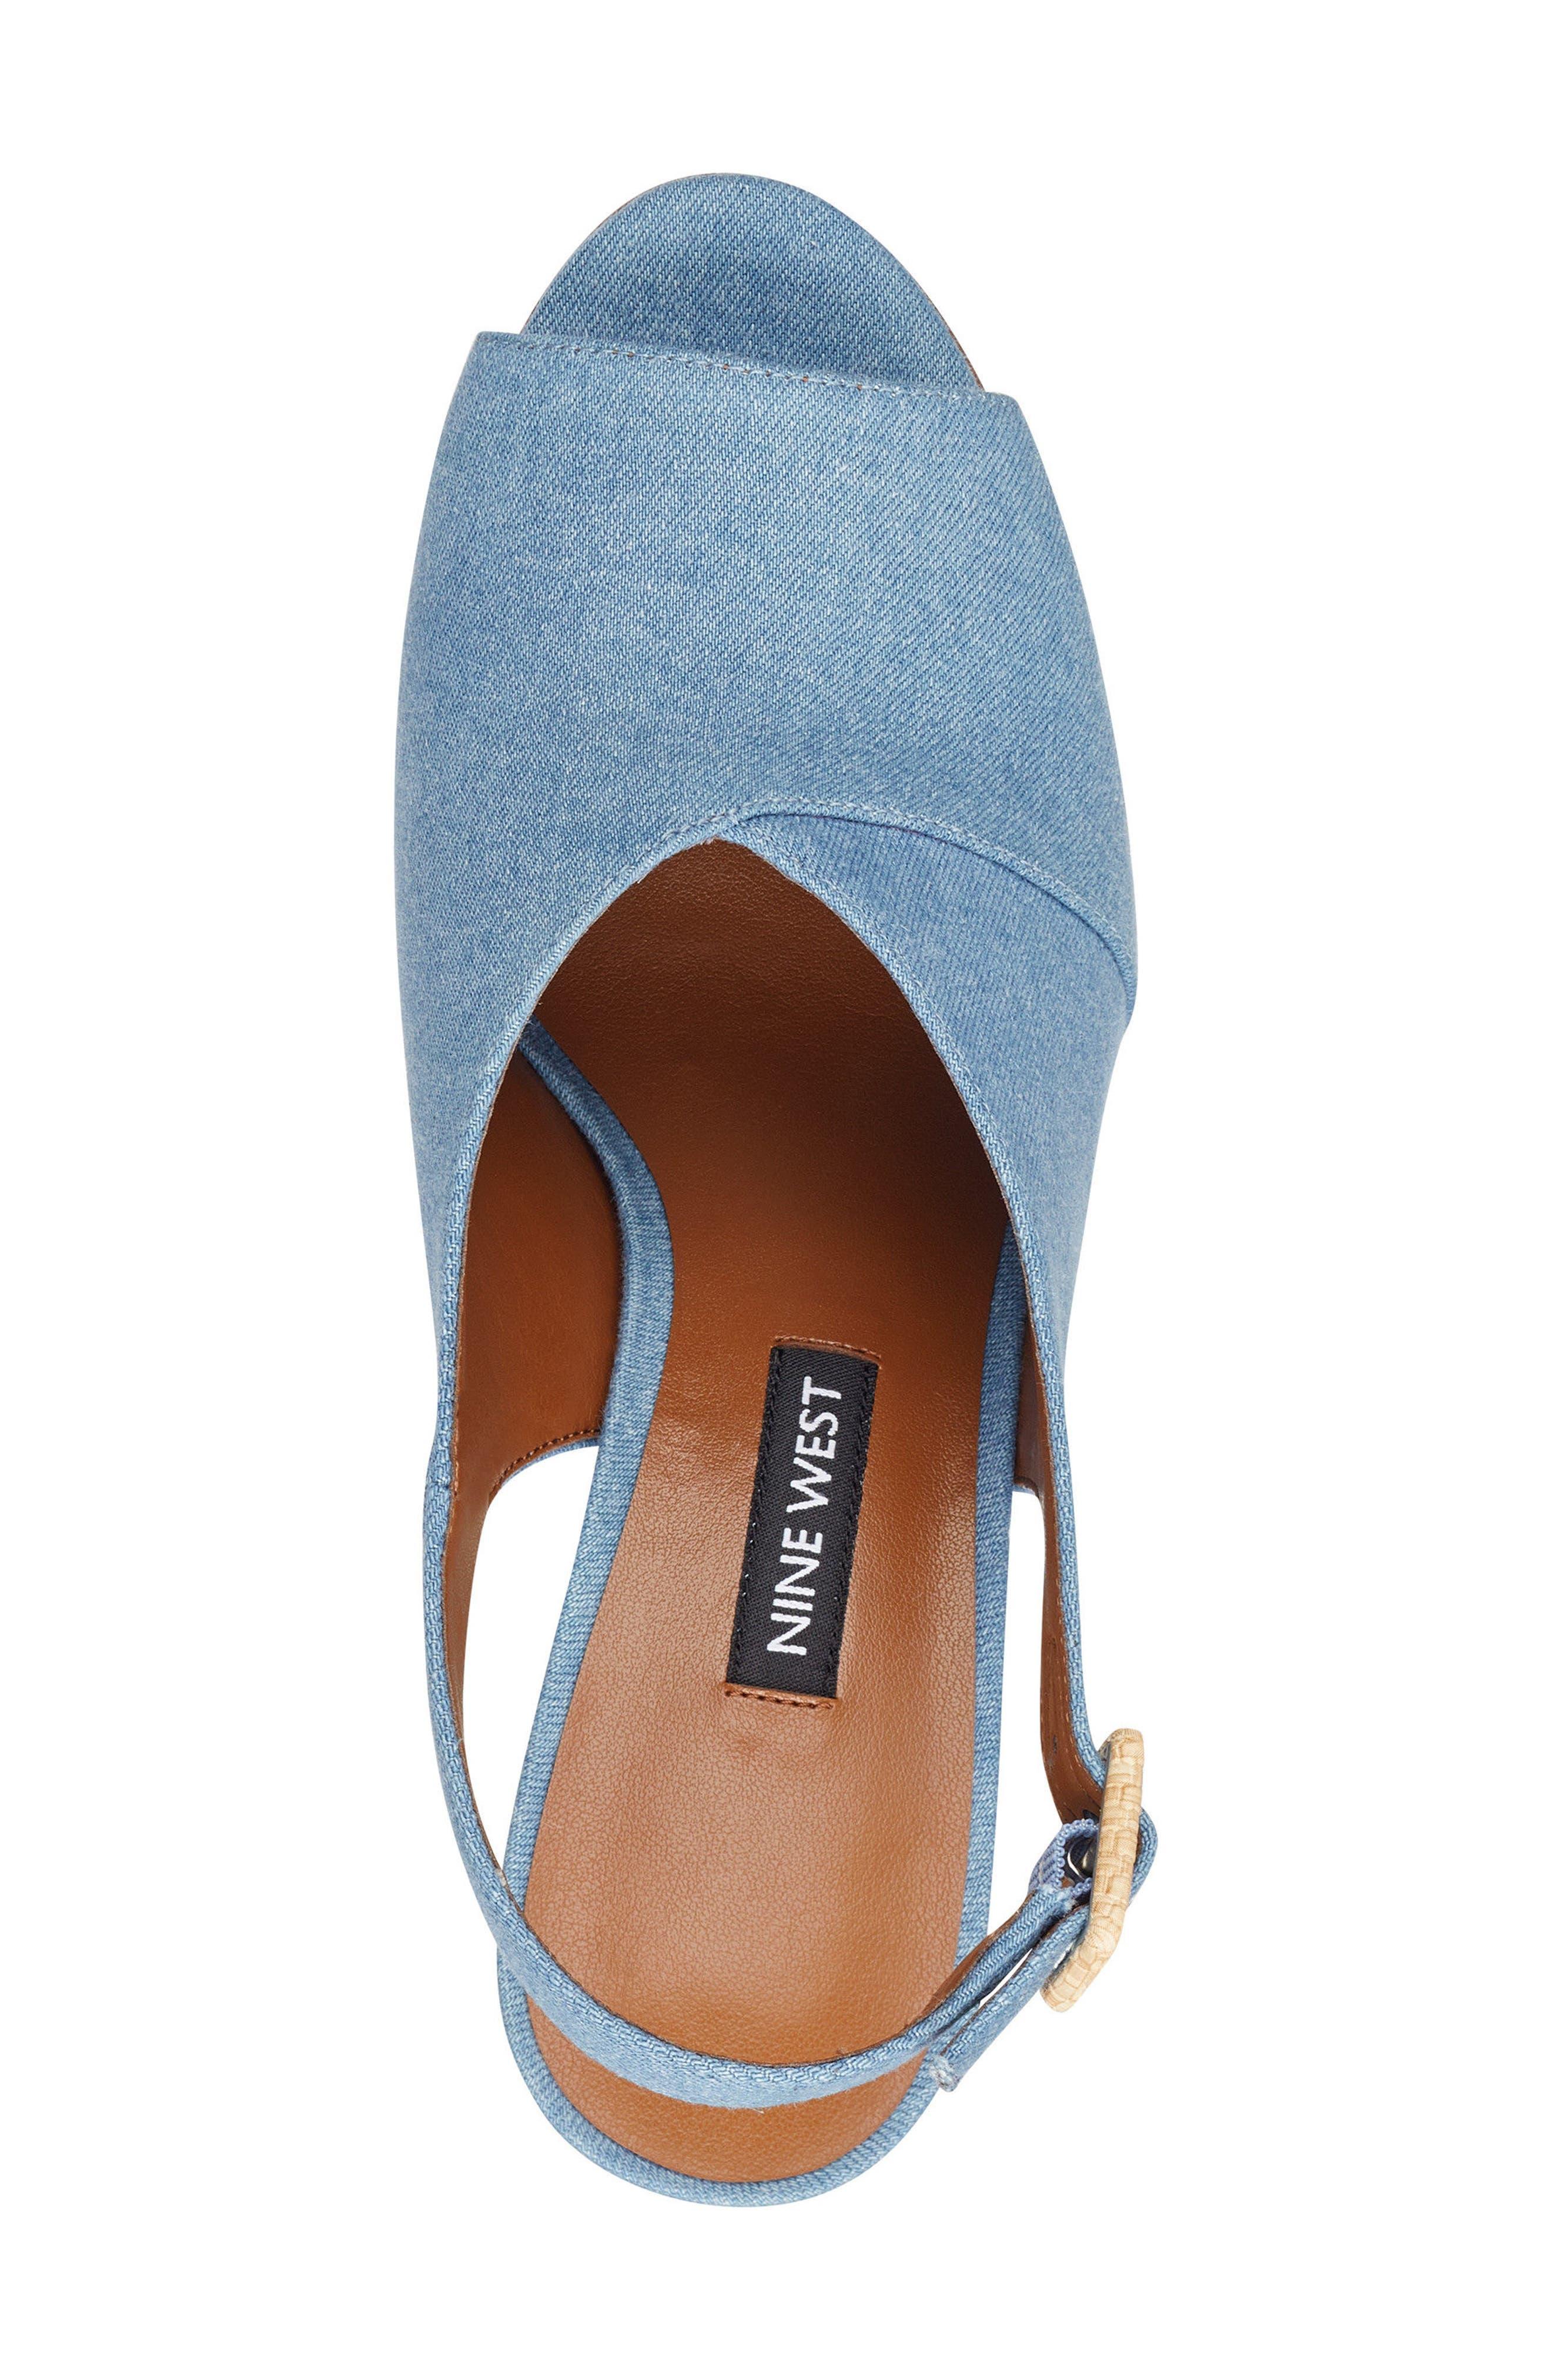 Morenzo Slingback Sandal,                             Alternate thumbnail 5, color,                             Light Blue Fabric